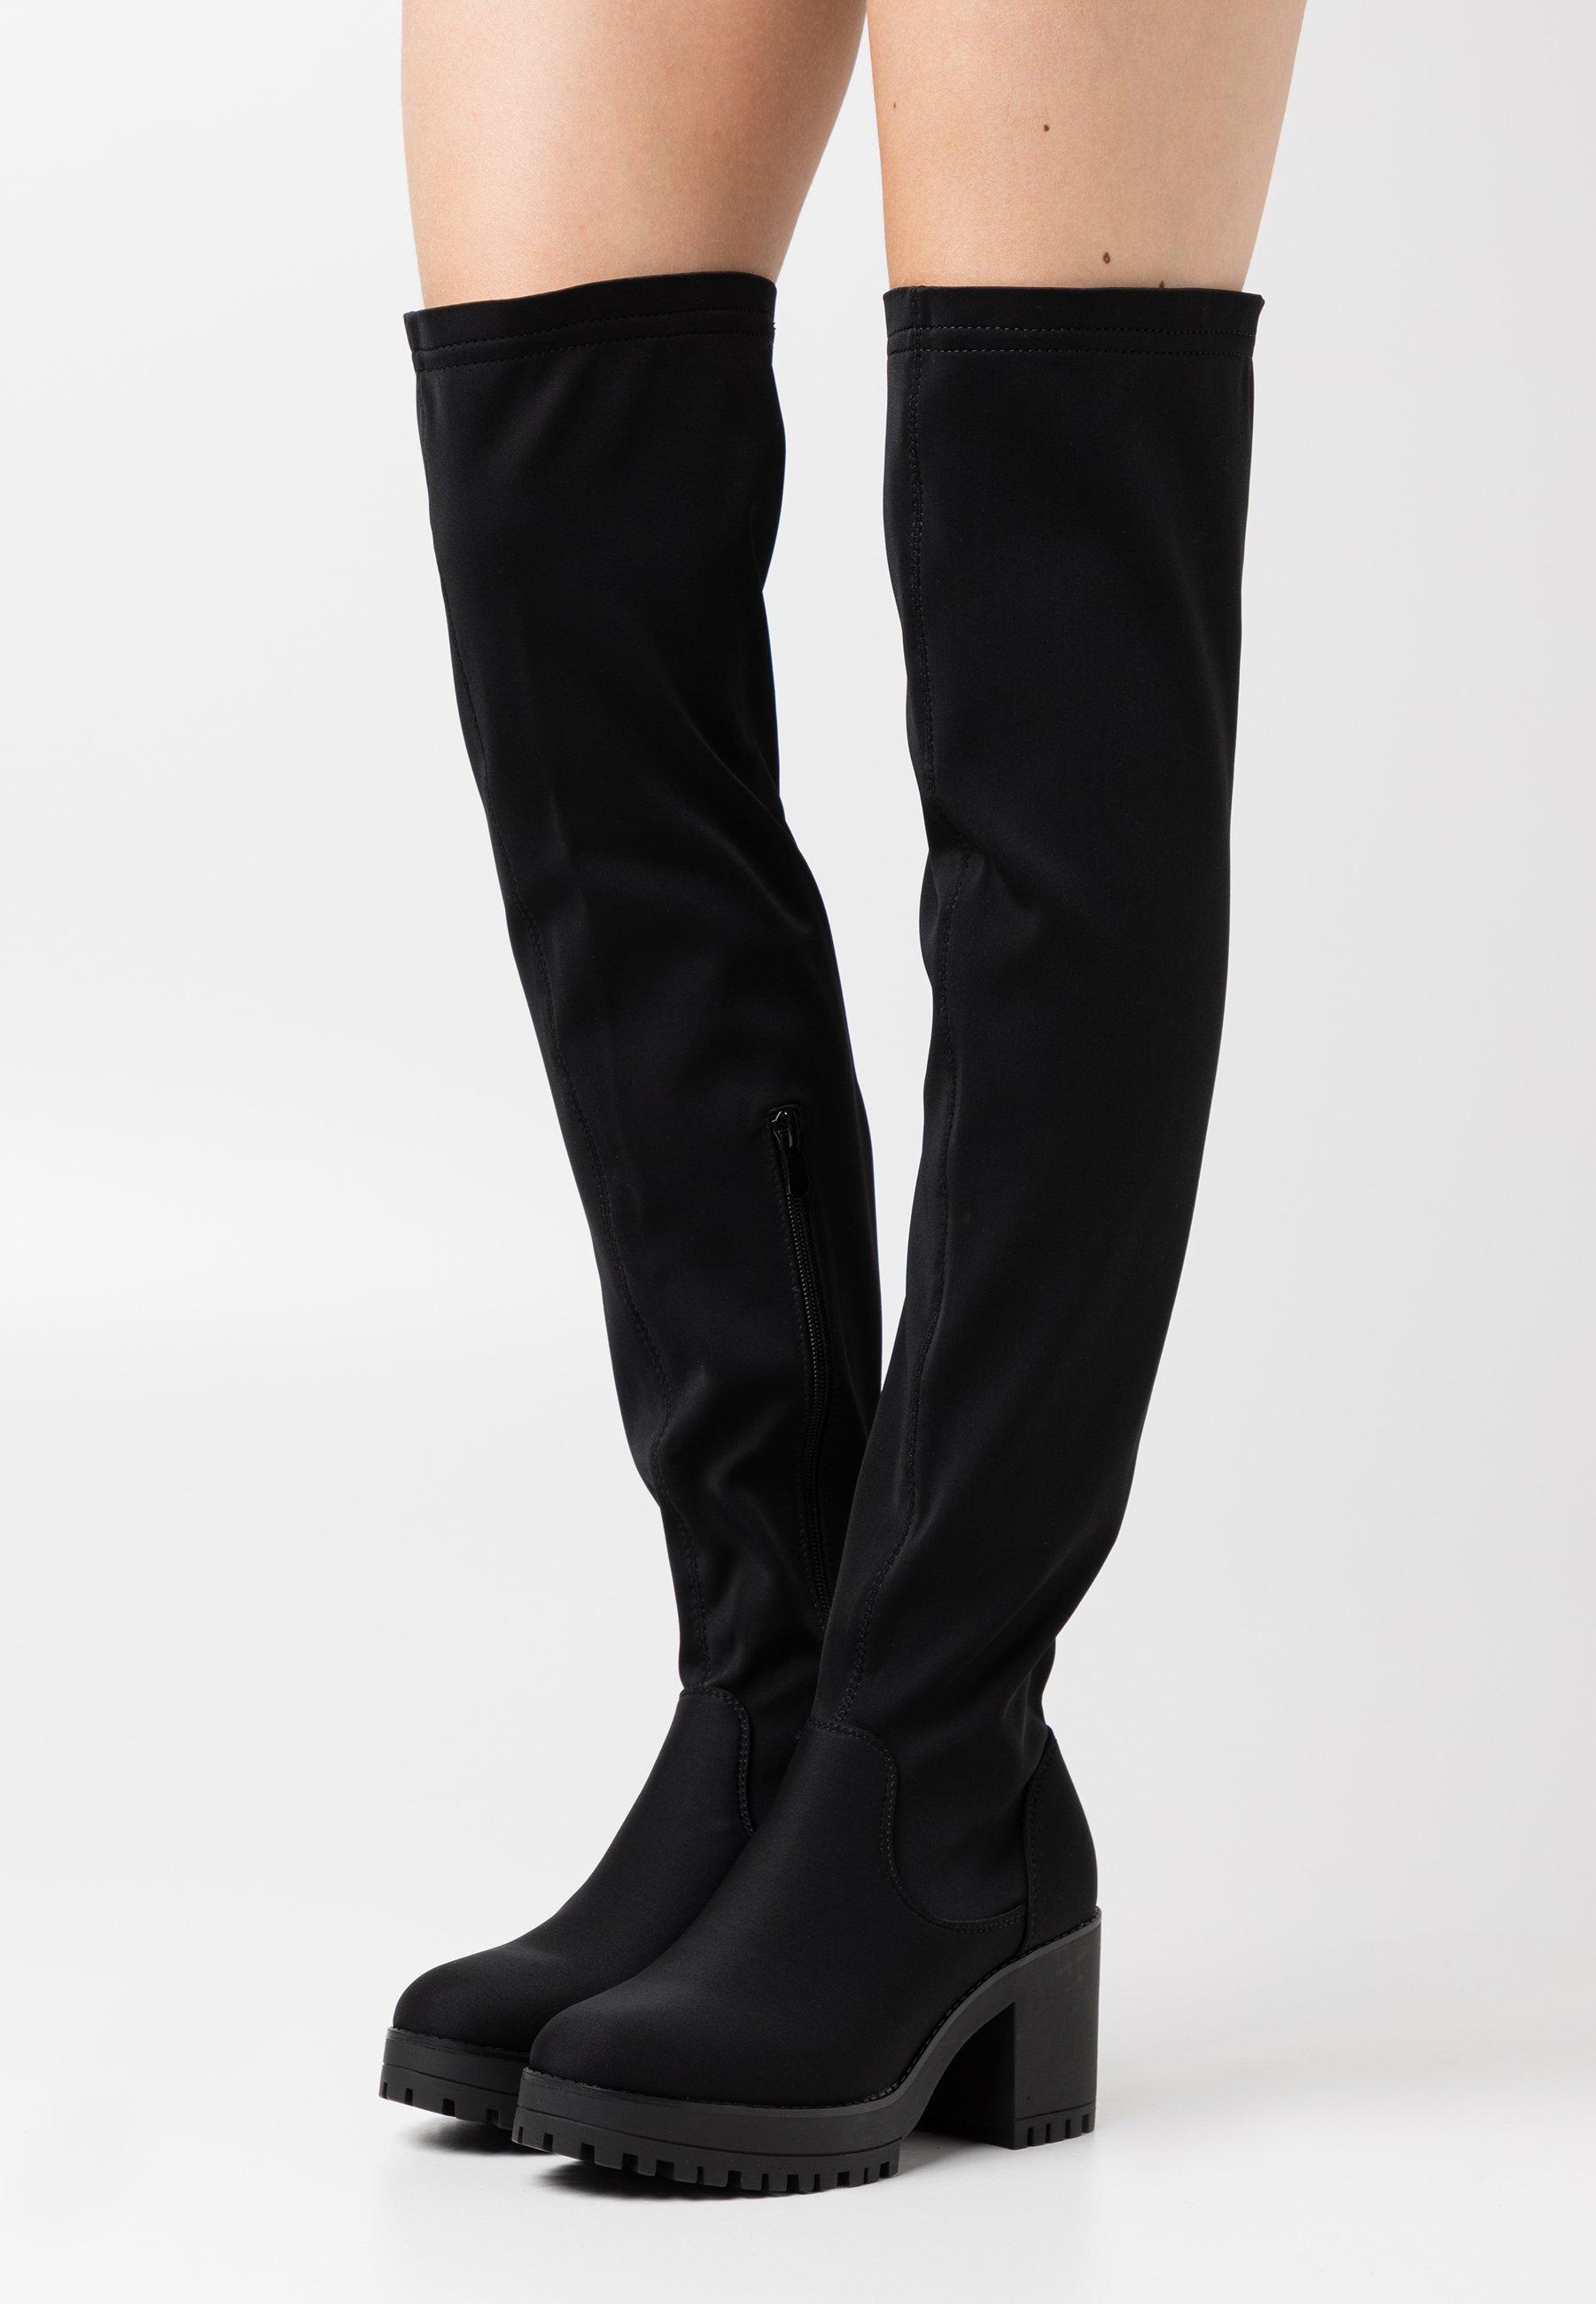 CHUNKY BOOTS Overknee laarzen black